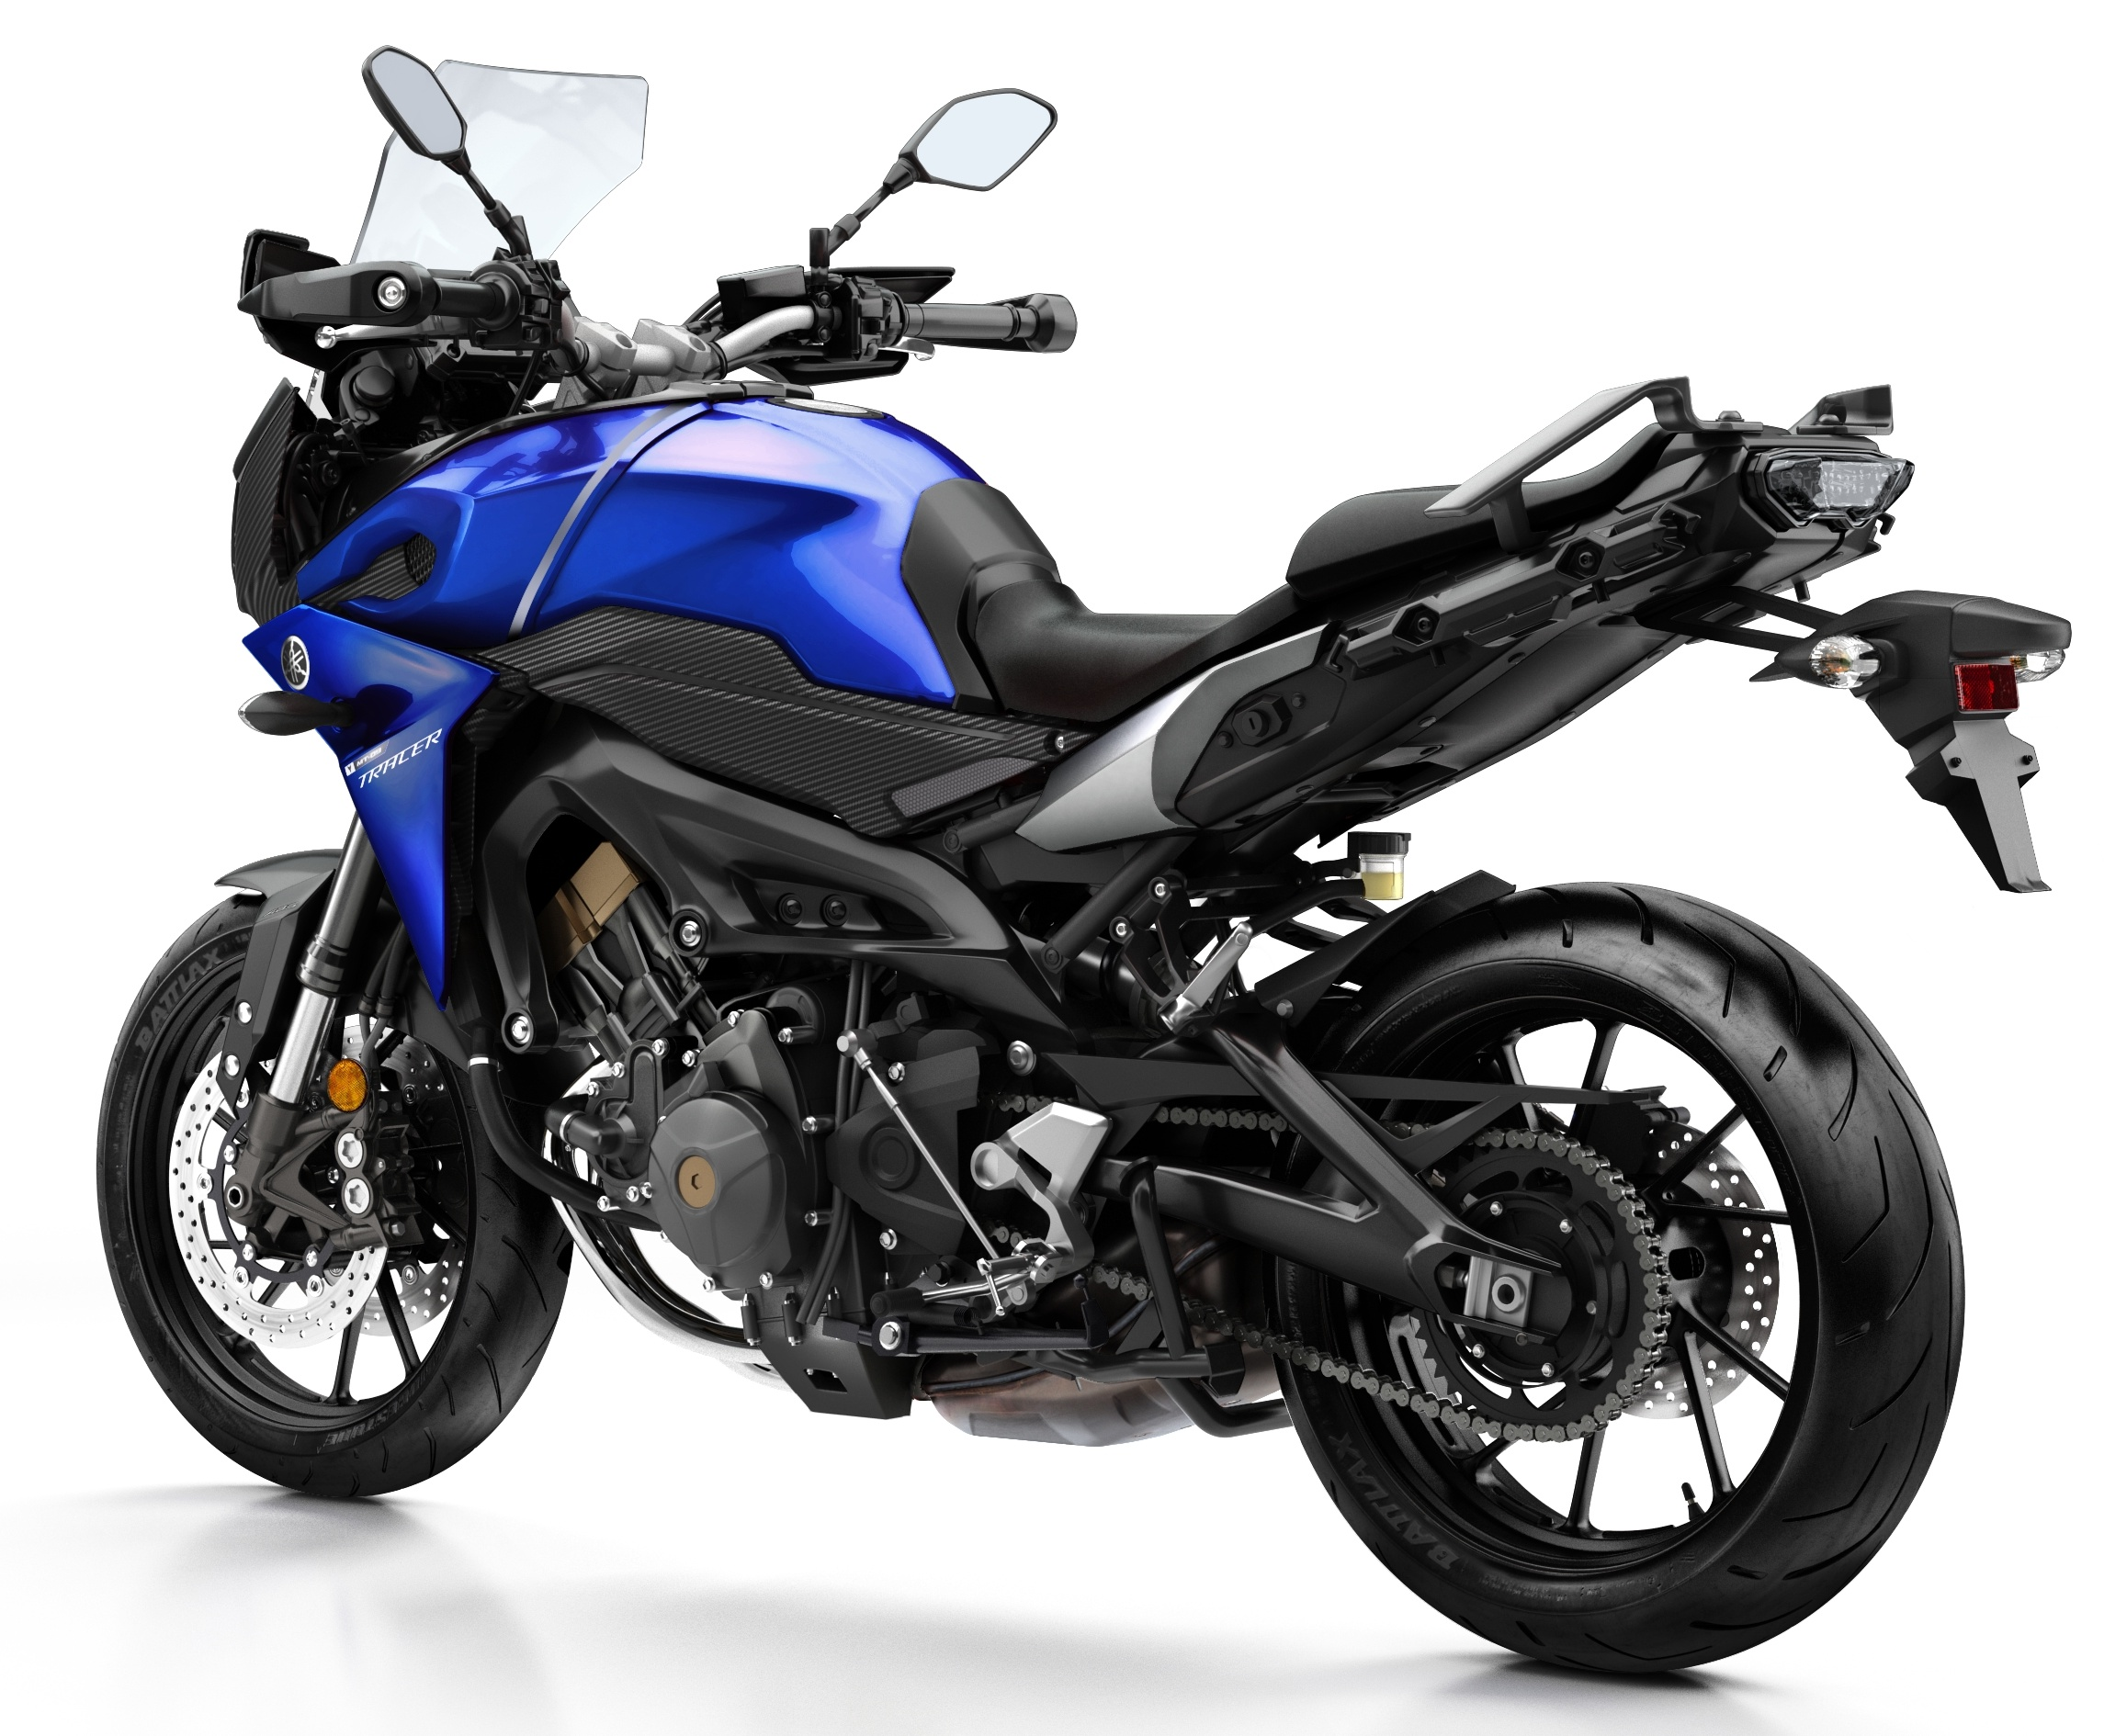 2017 yamaha motorcycles get new colour schemes image 556097. Black Bedroom Furniture Sets. Home Design Ideas